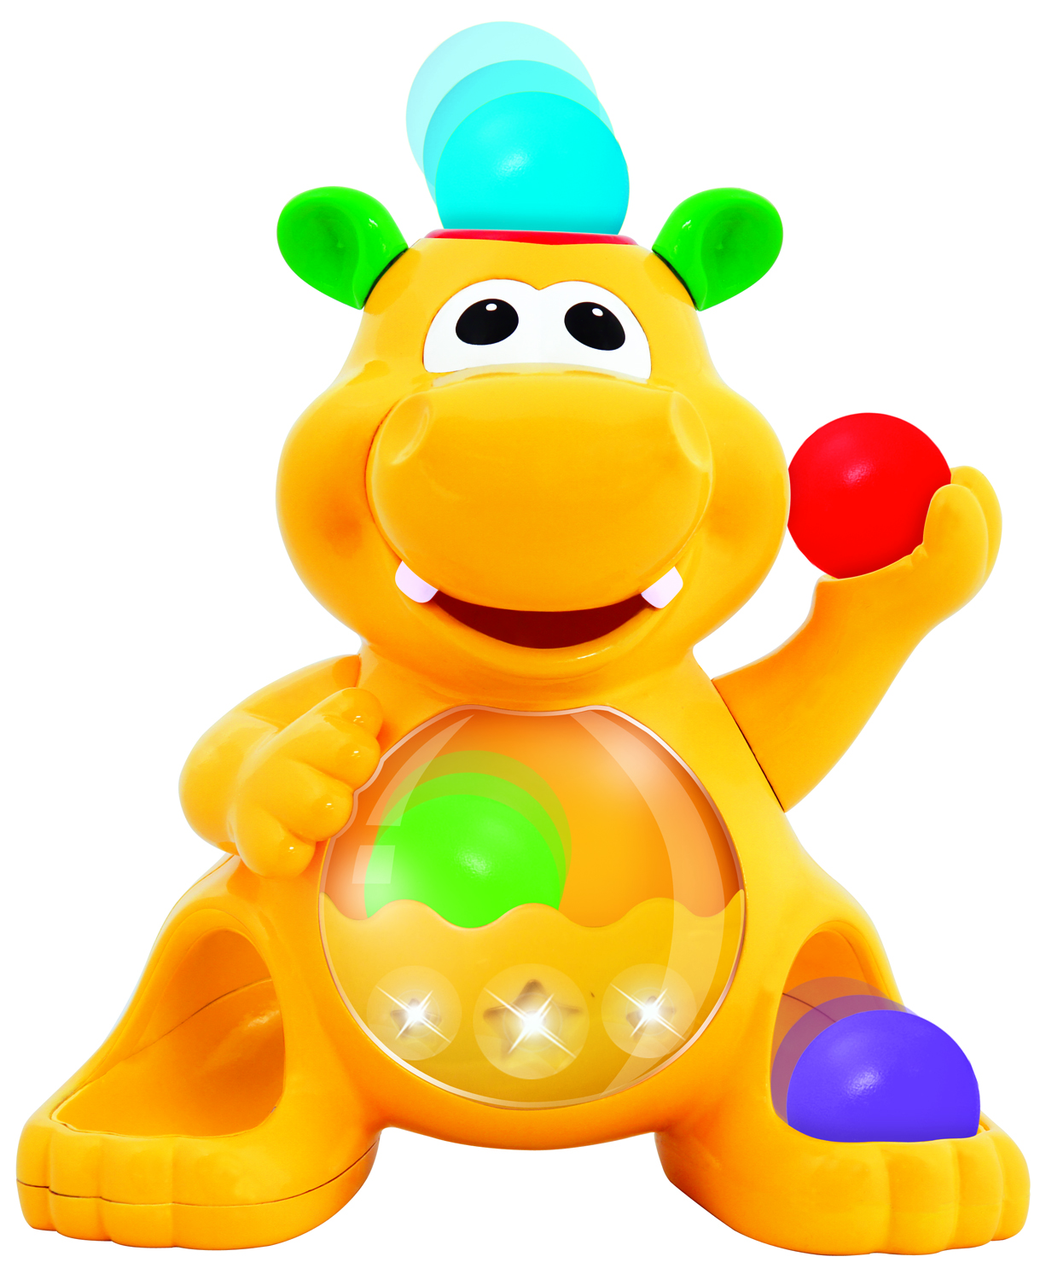 Іграшка - Гіпопотам-Жонглер